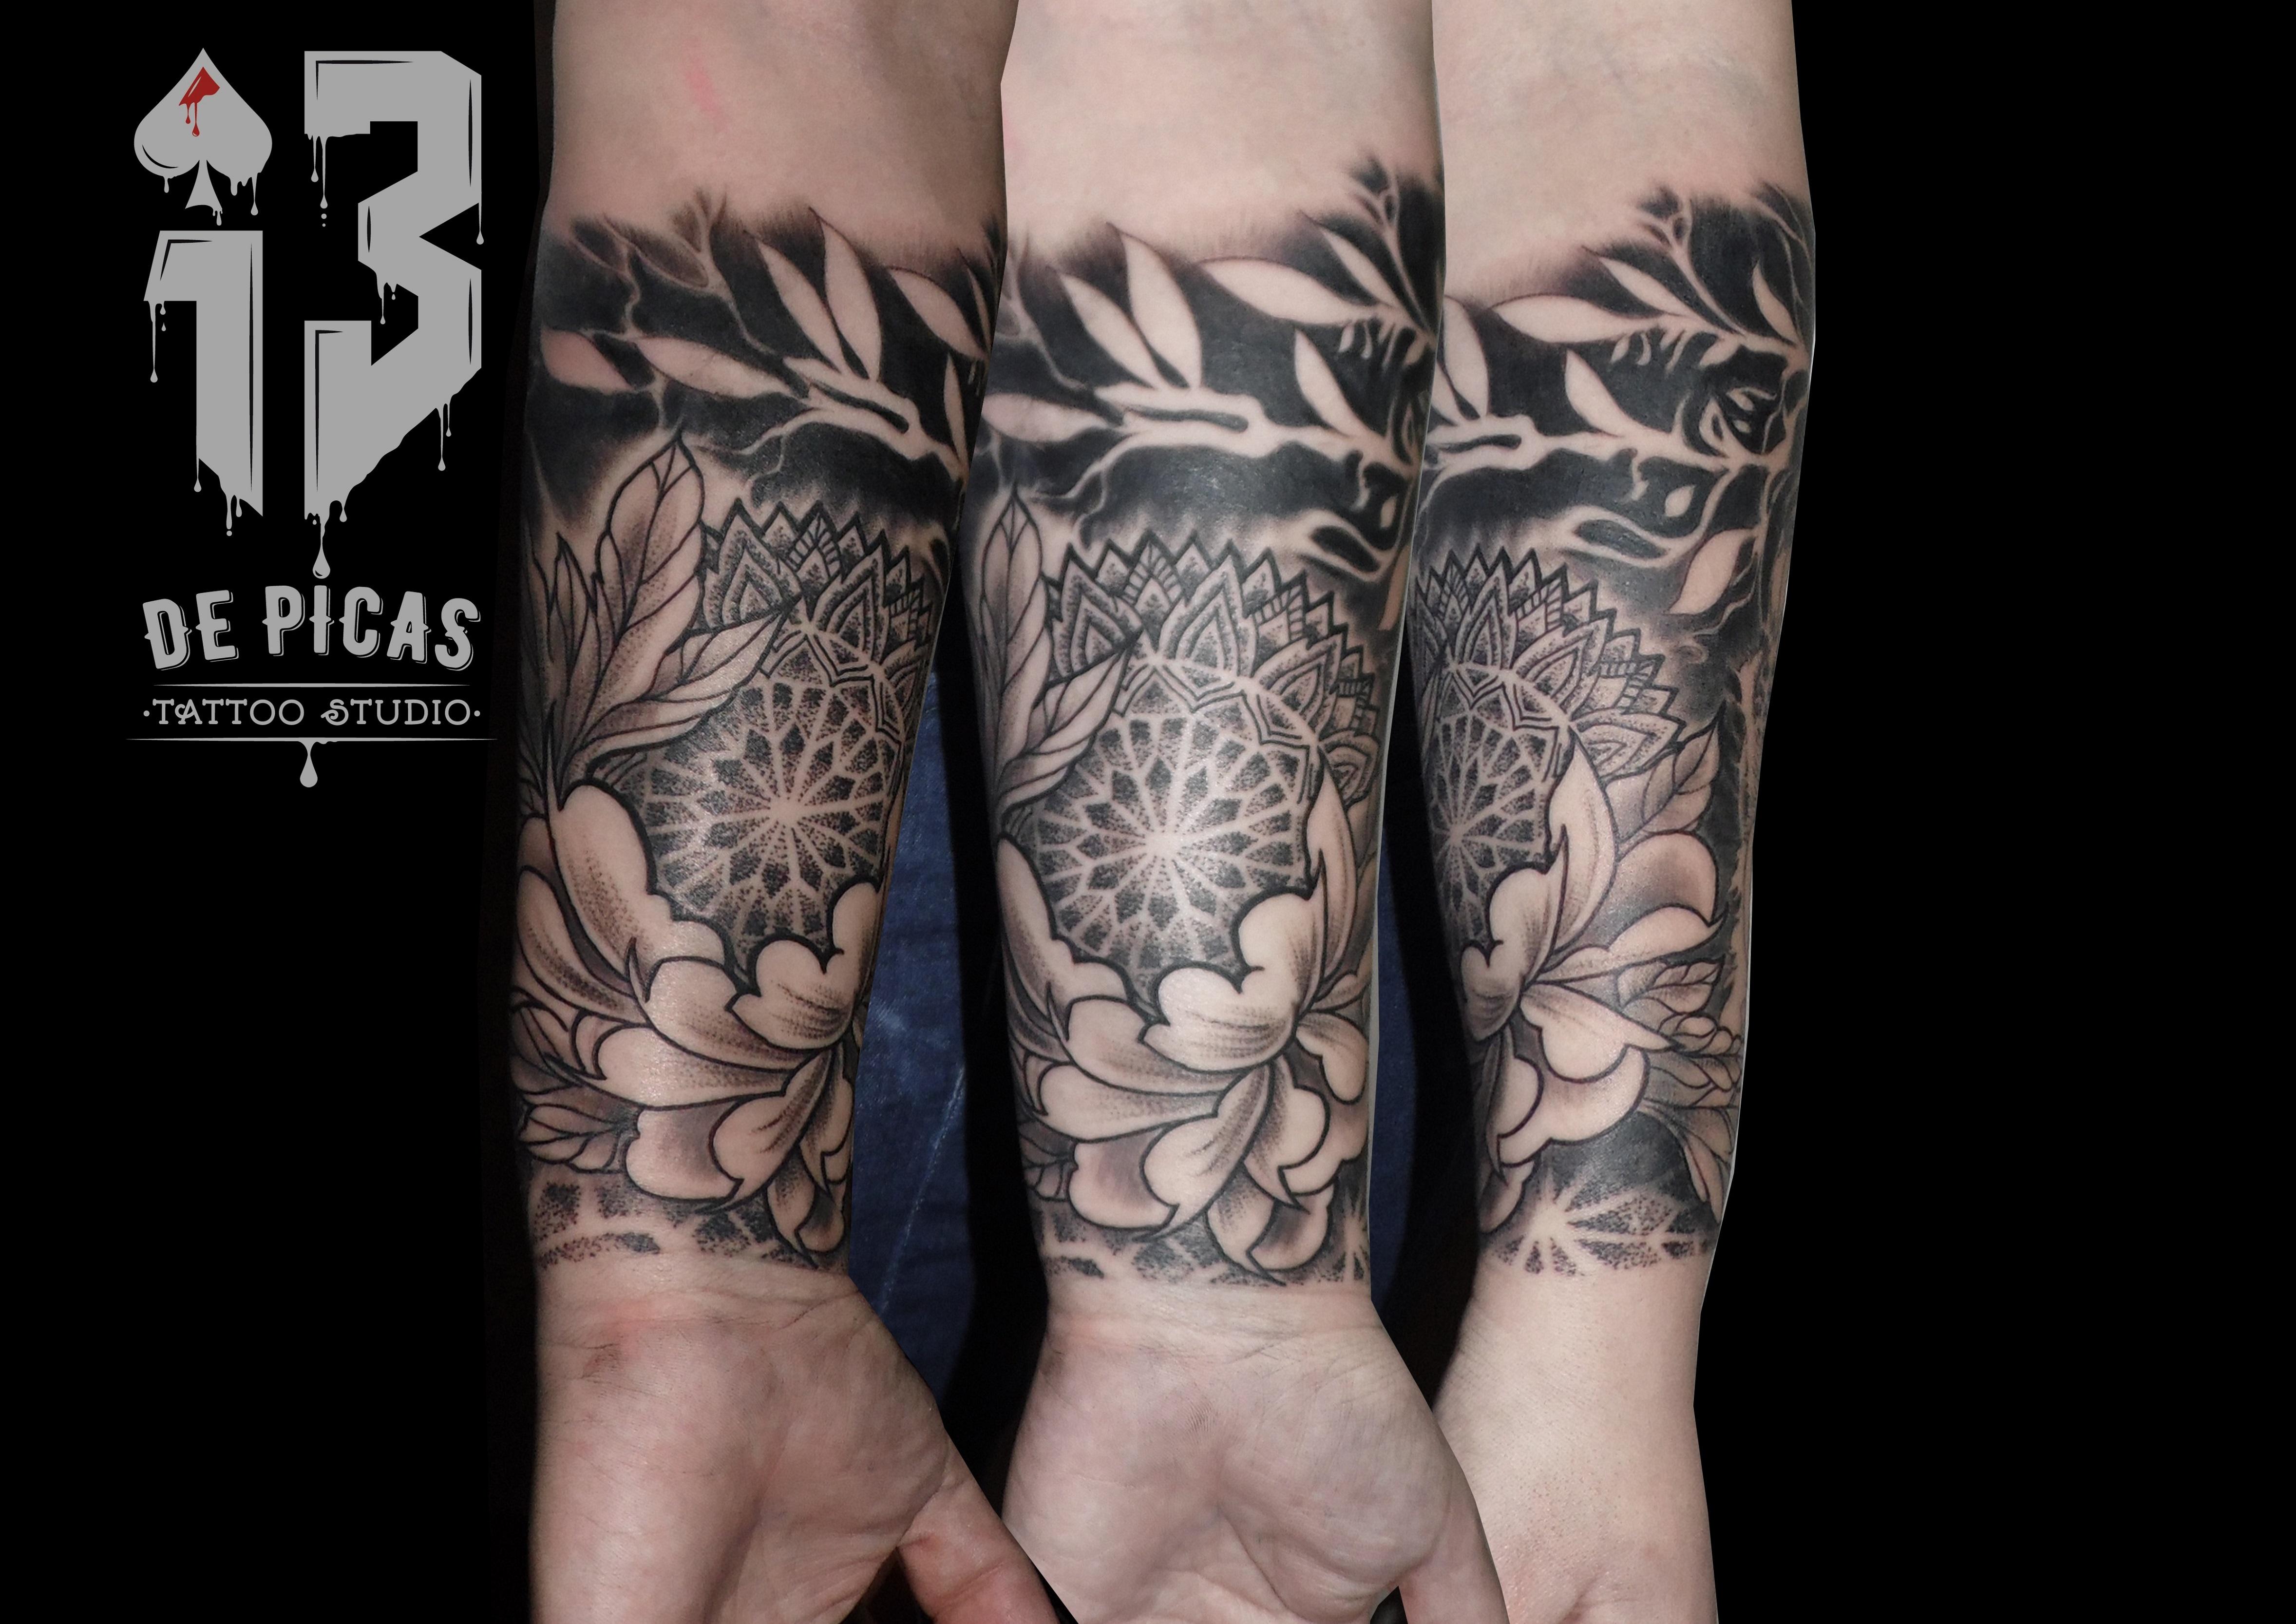 mandala cover tatuaje tattoo puntillista flores antebrazo negro gris 13 de picas jaca huesca